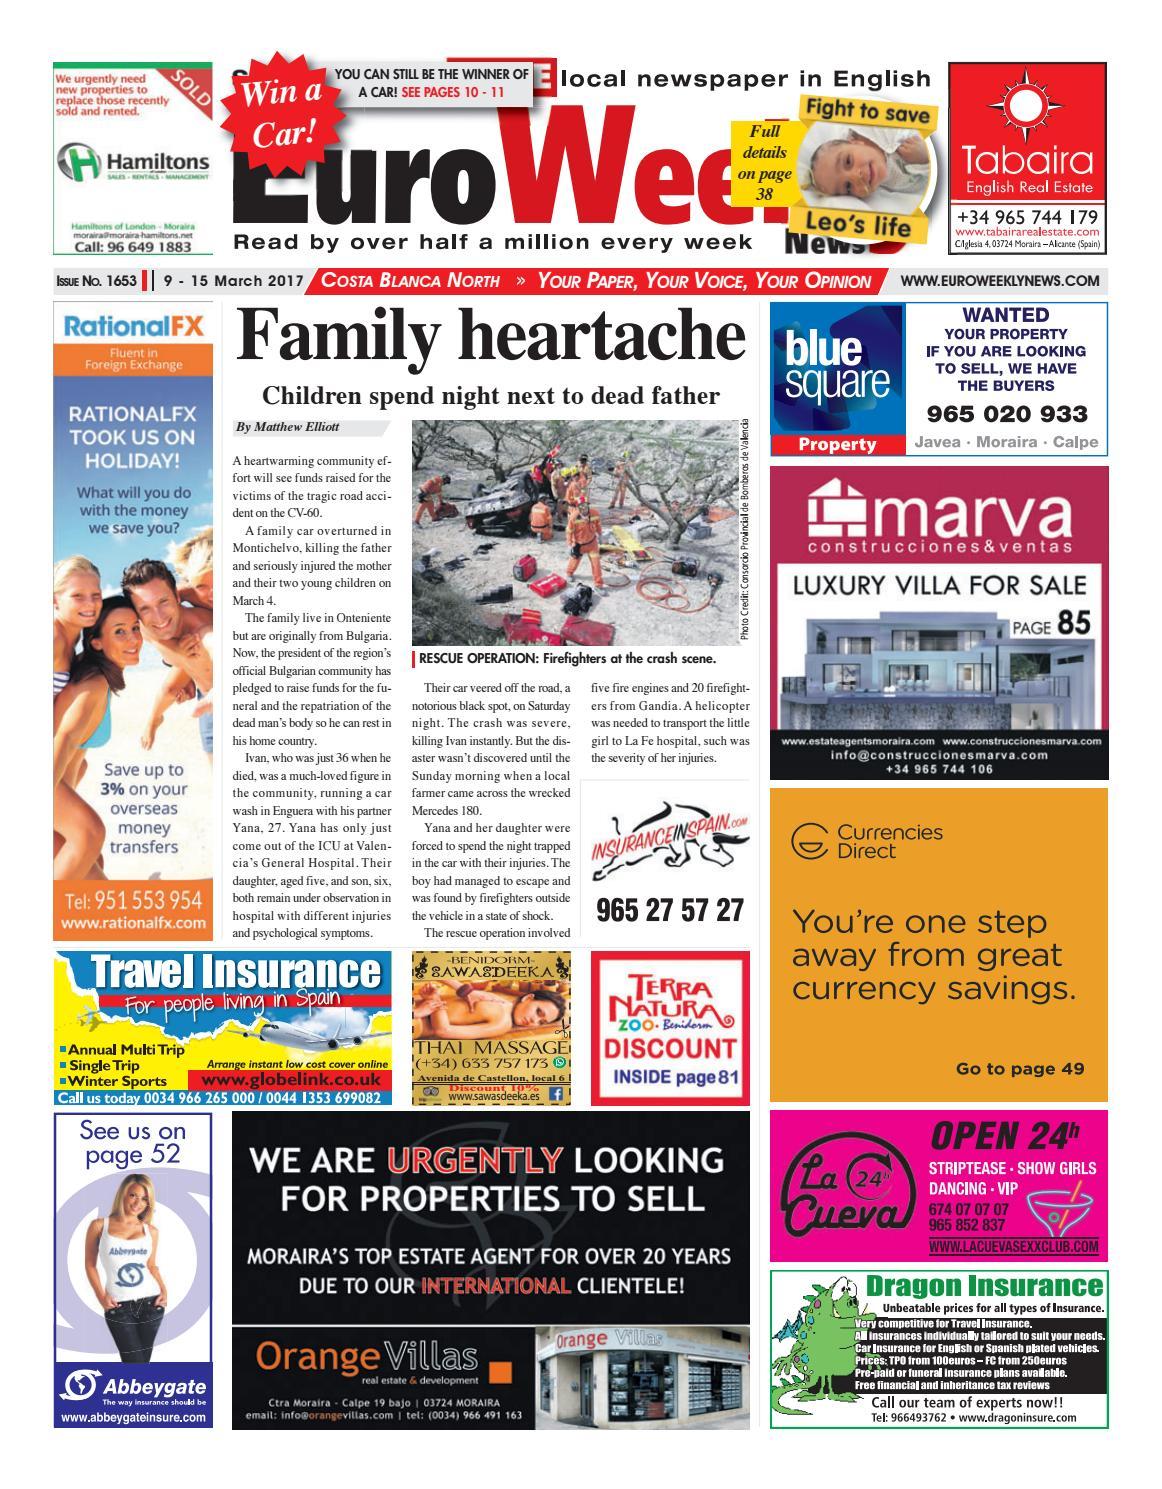 Euro Weekly News - Costa Blanca North 9 - 15 March 2017